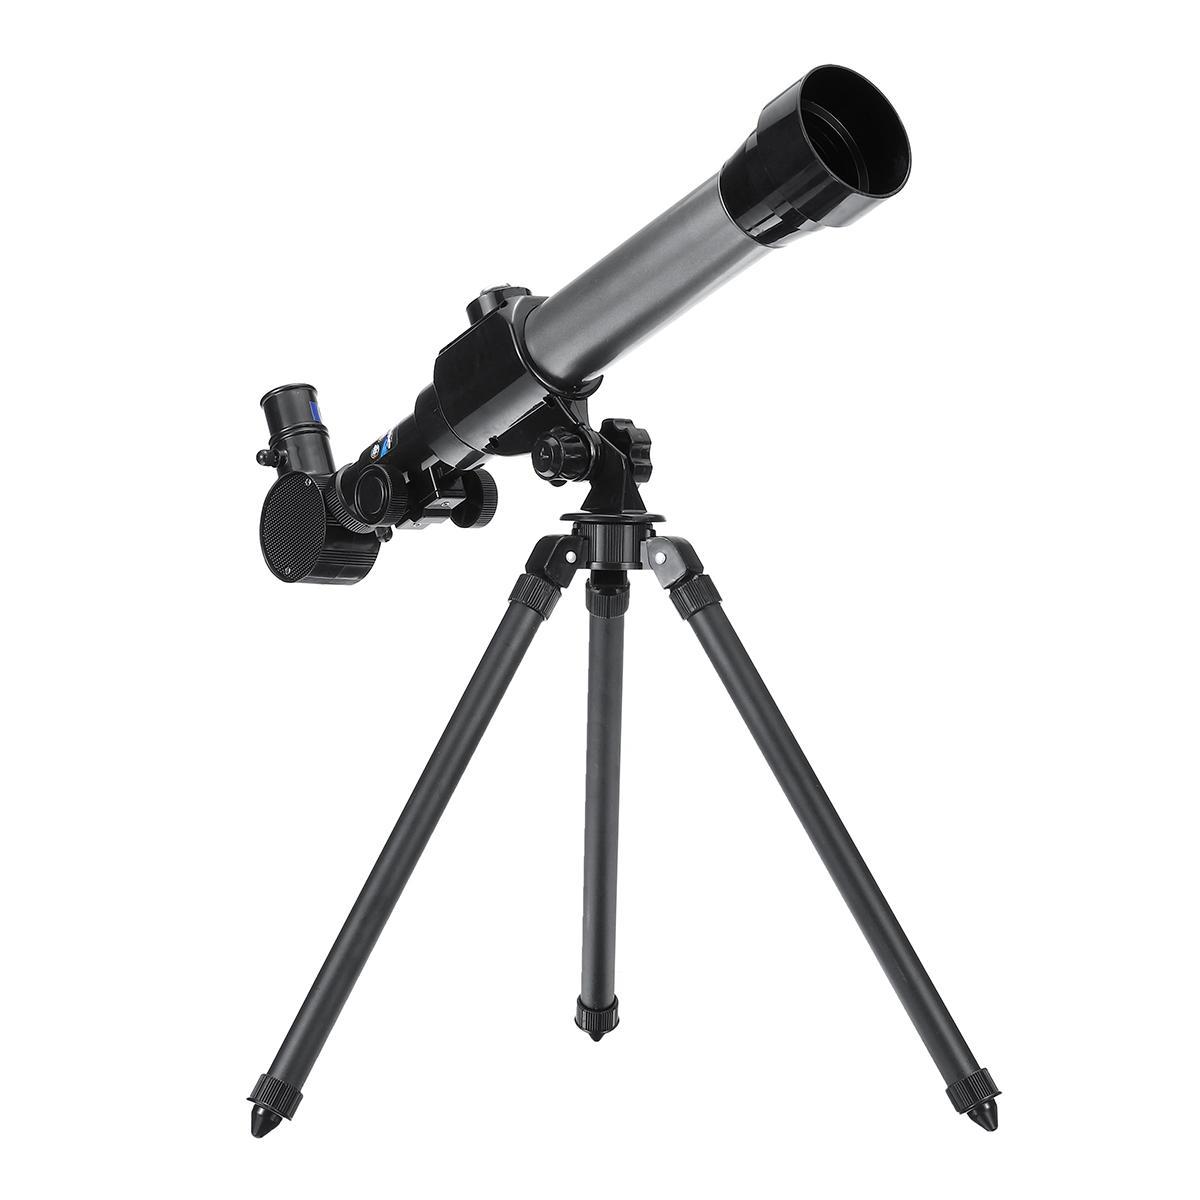 20/30/40X Astronomical Telescope Simple Child Version HD Space Landscape Spotting Scope Monicular